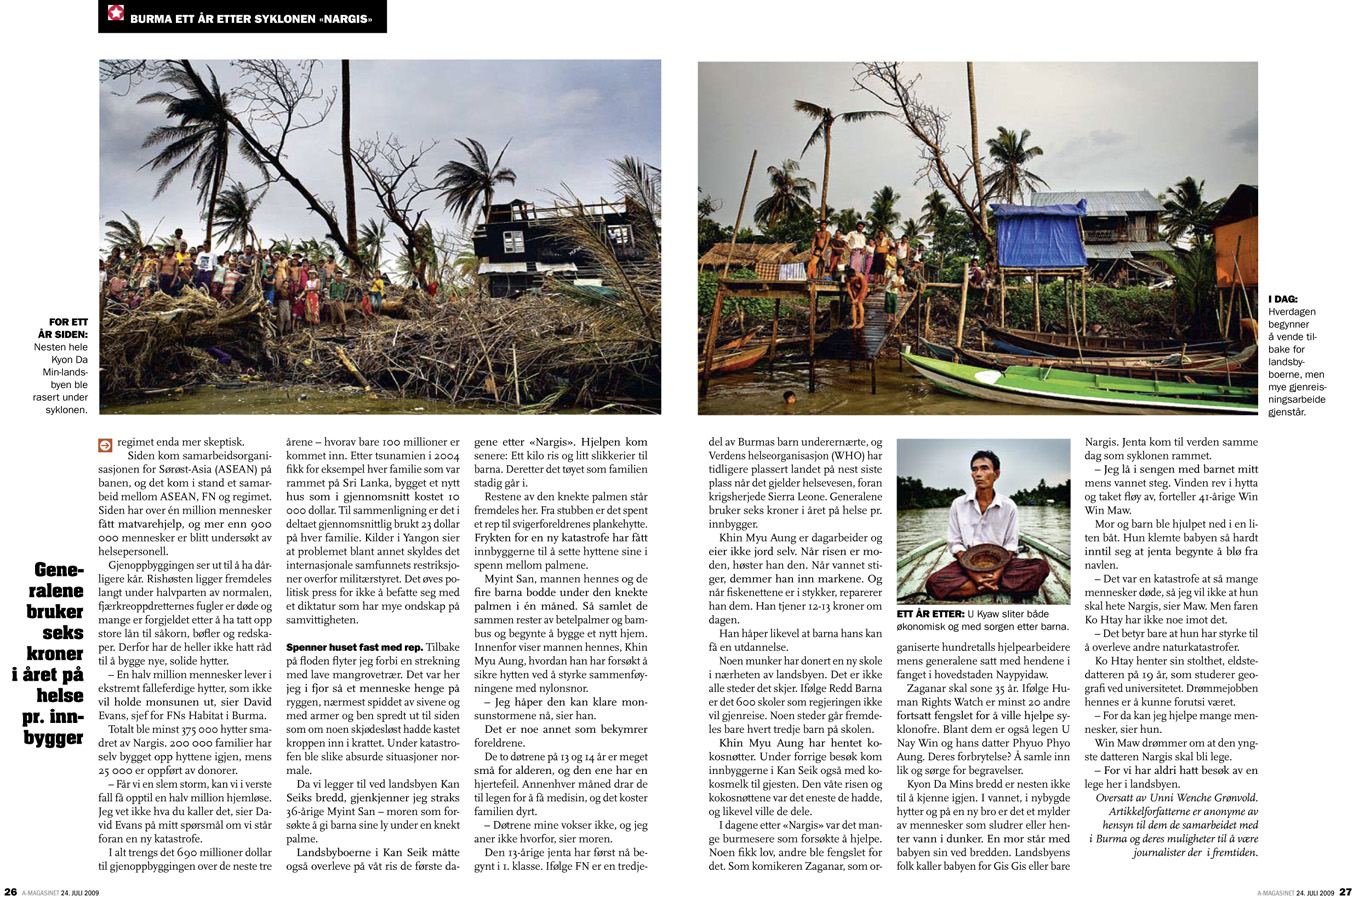 AFTENPOSTEN_Burma_One_Year-5.jpg